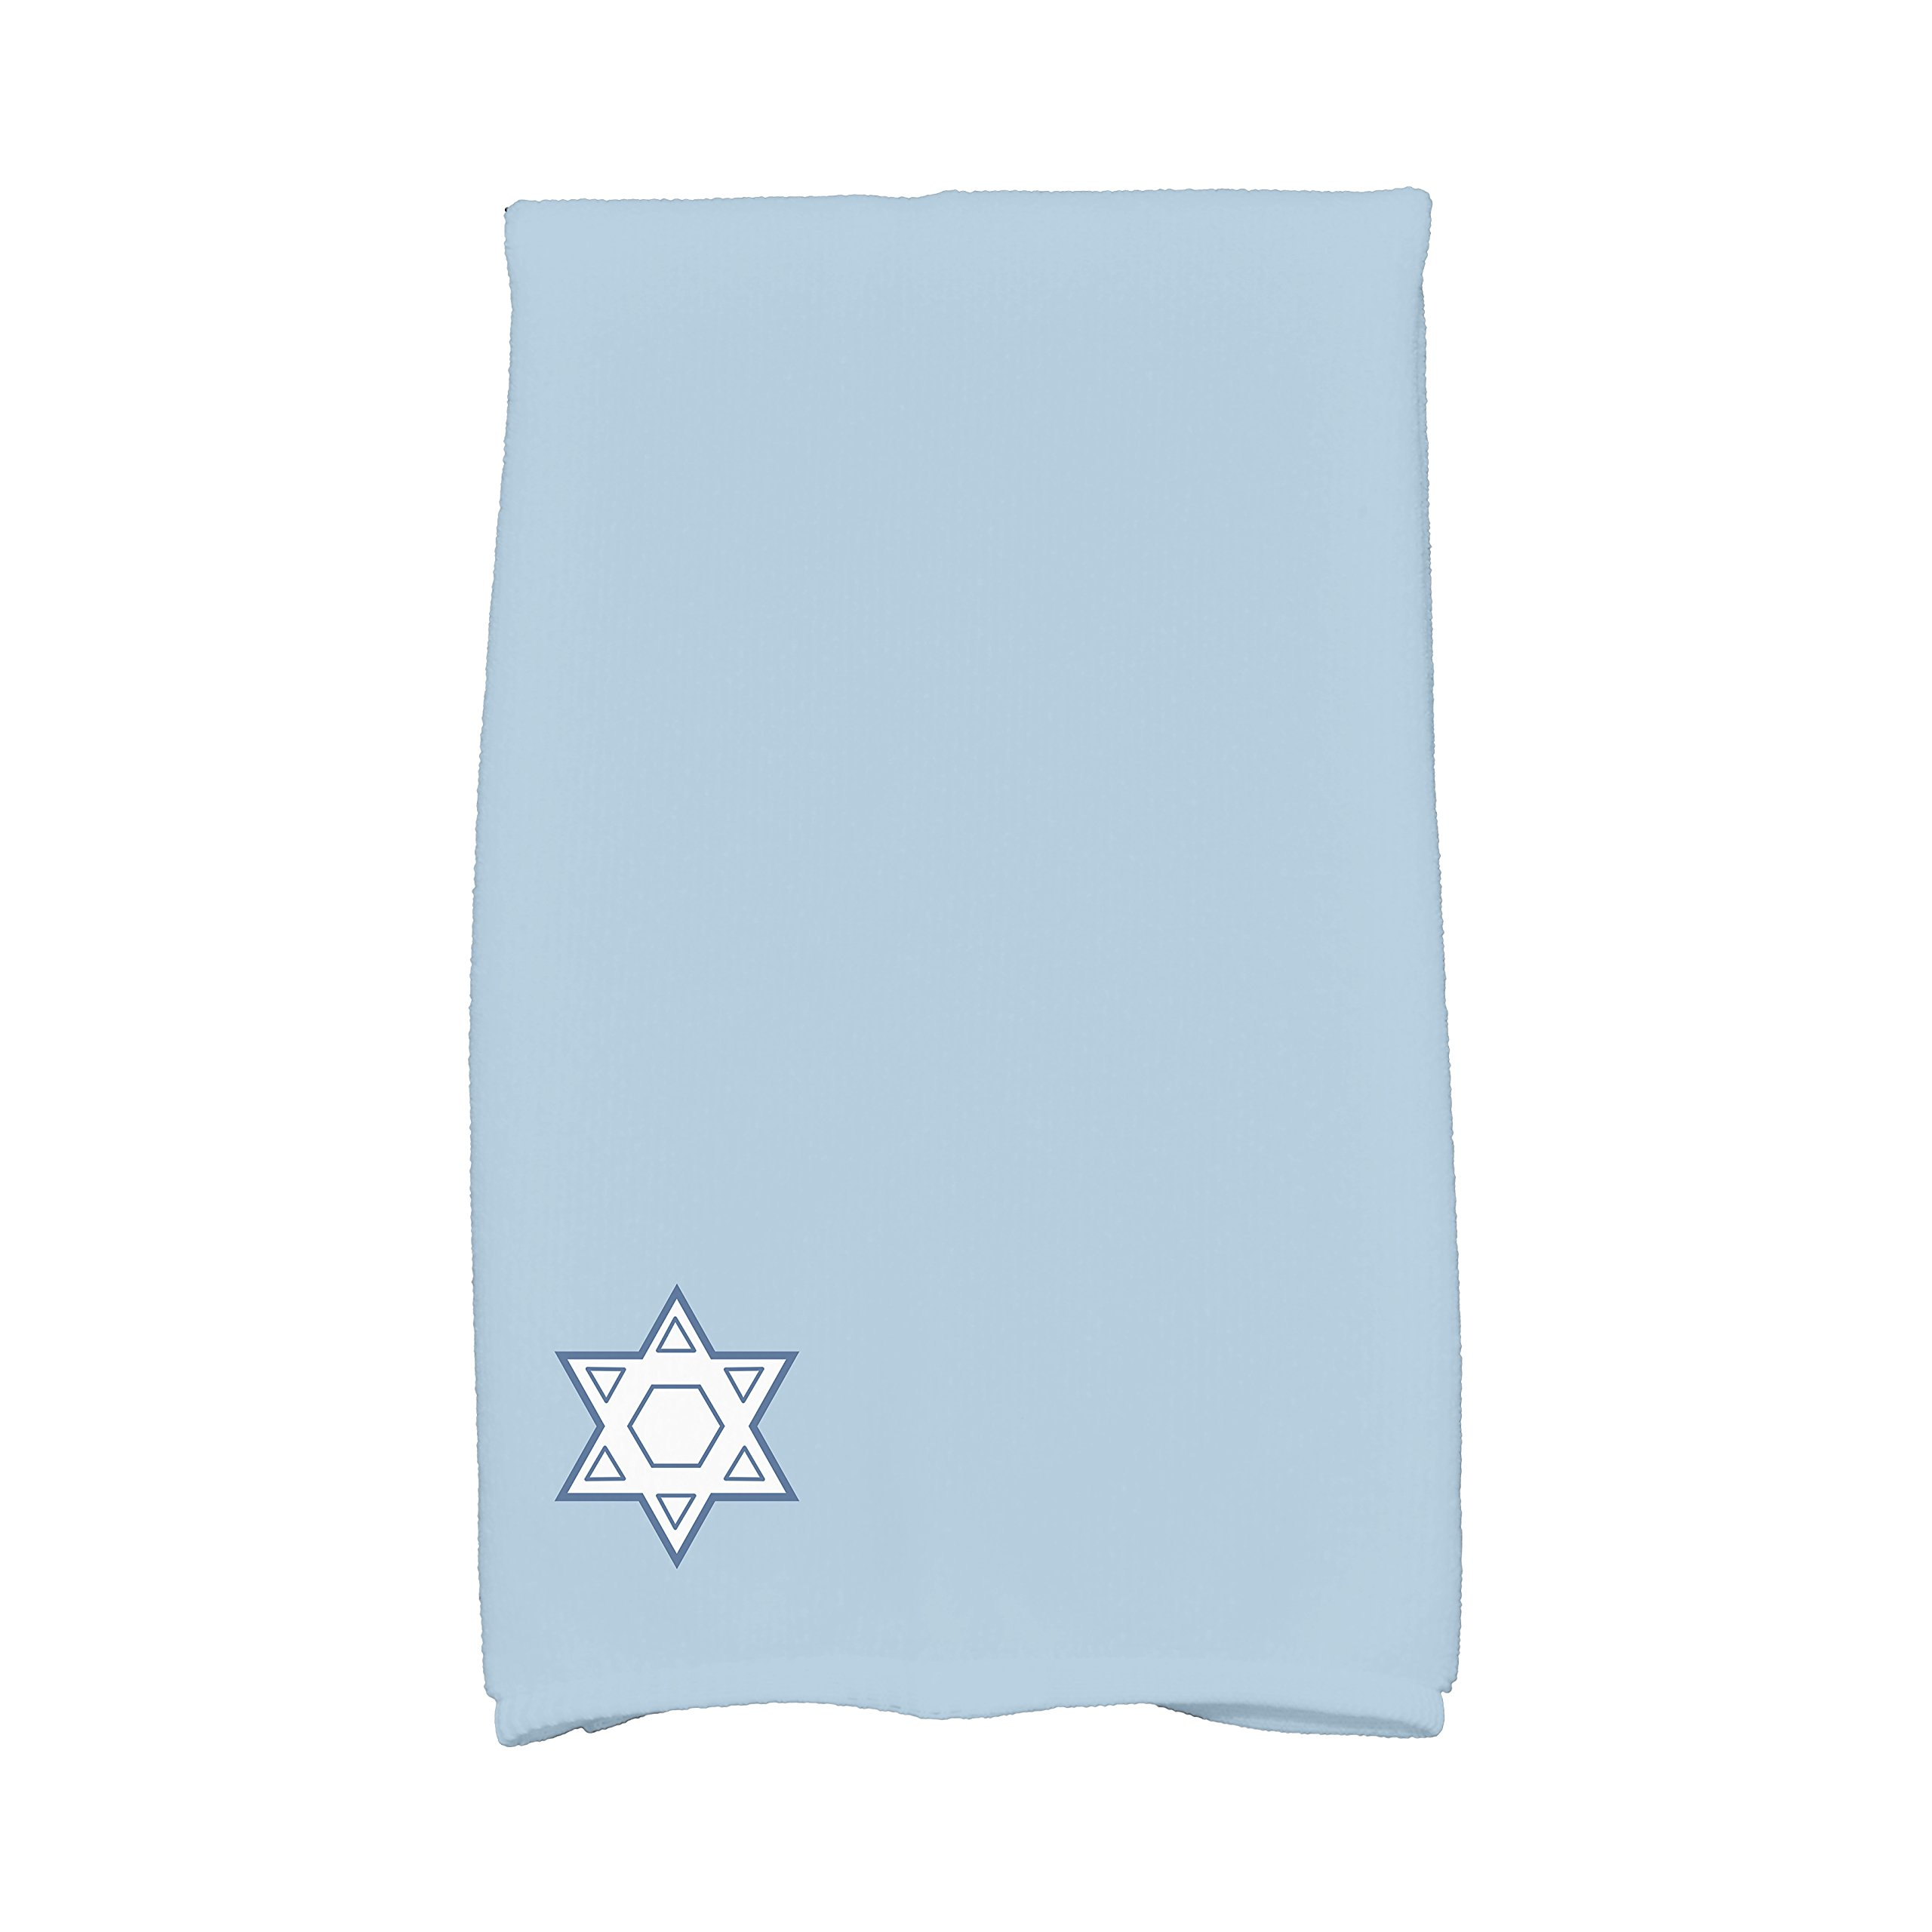 E by design KTHG964BL47 Star's Corner, Geometric Print Kitchen Towel, 16 x 25, Blue